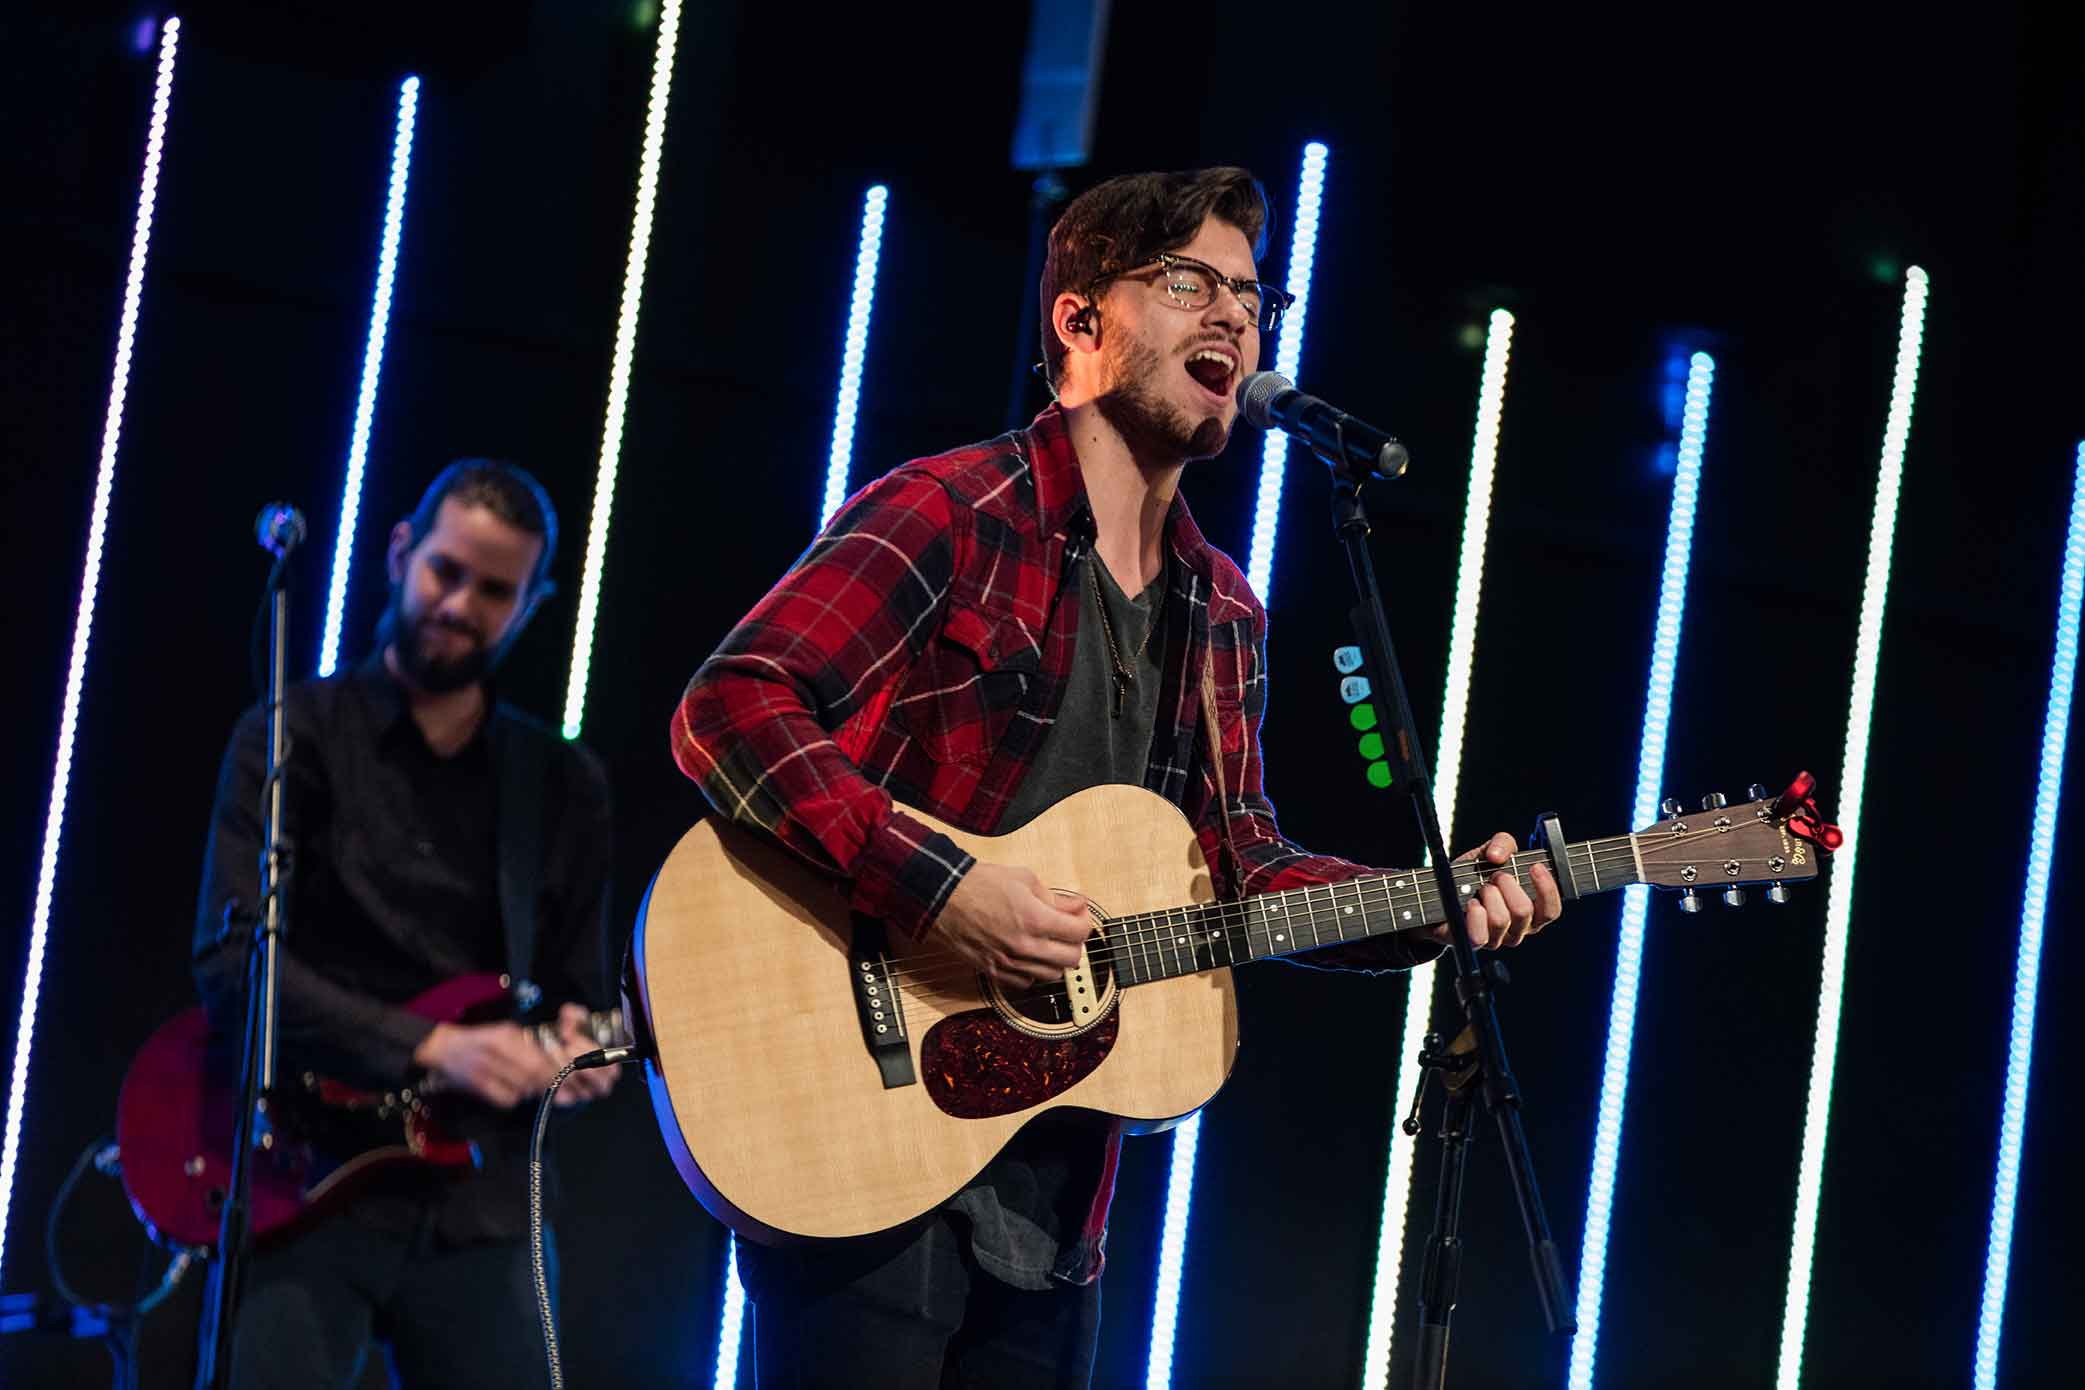 Student Leading worship